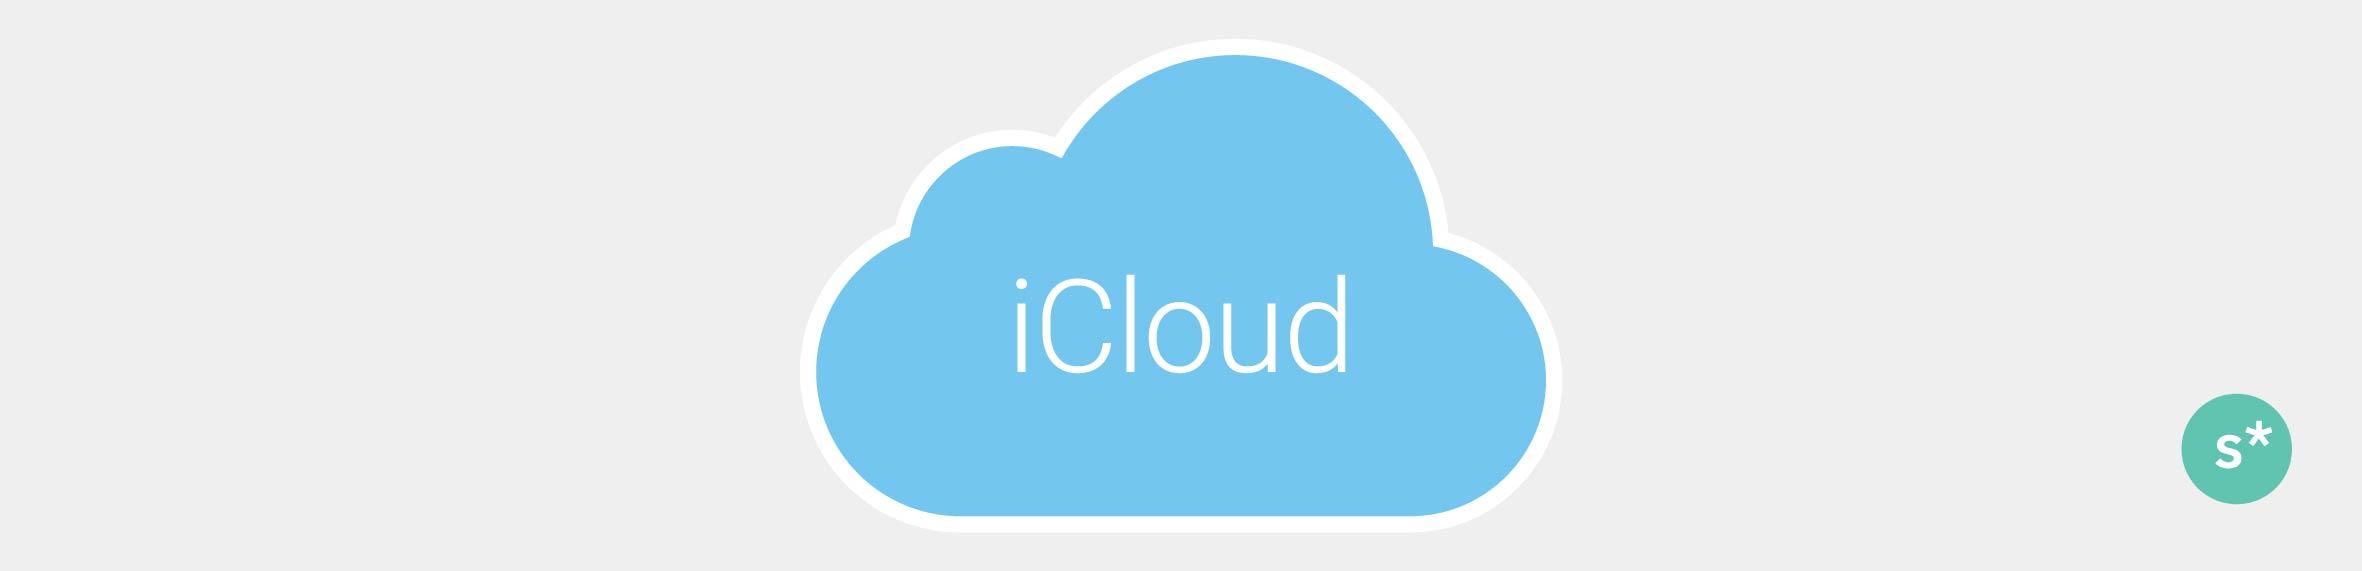 icloud_on